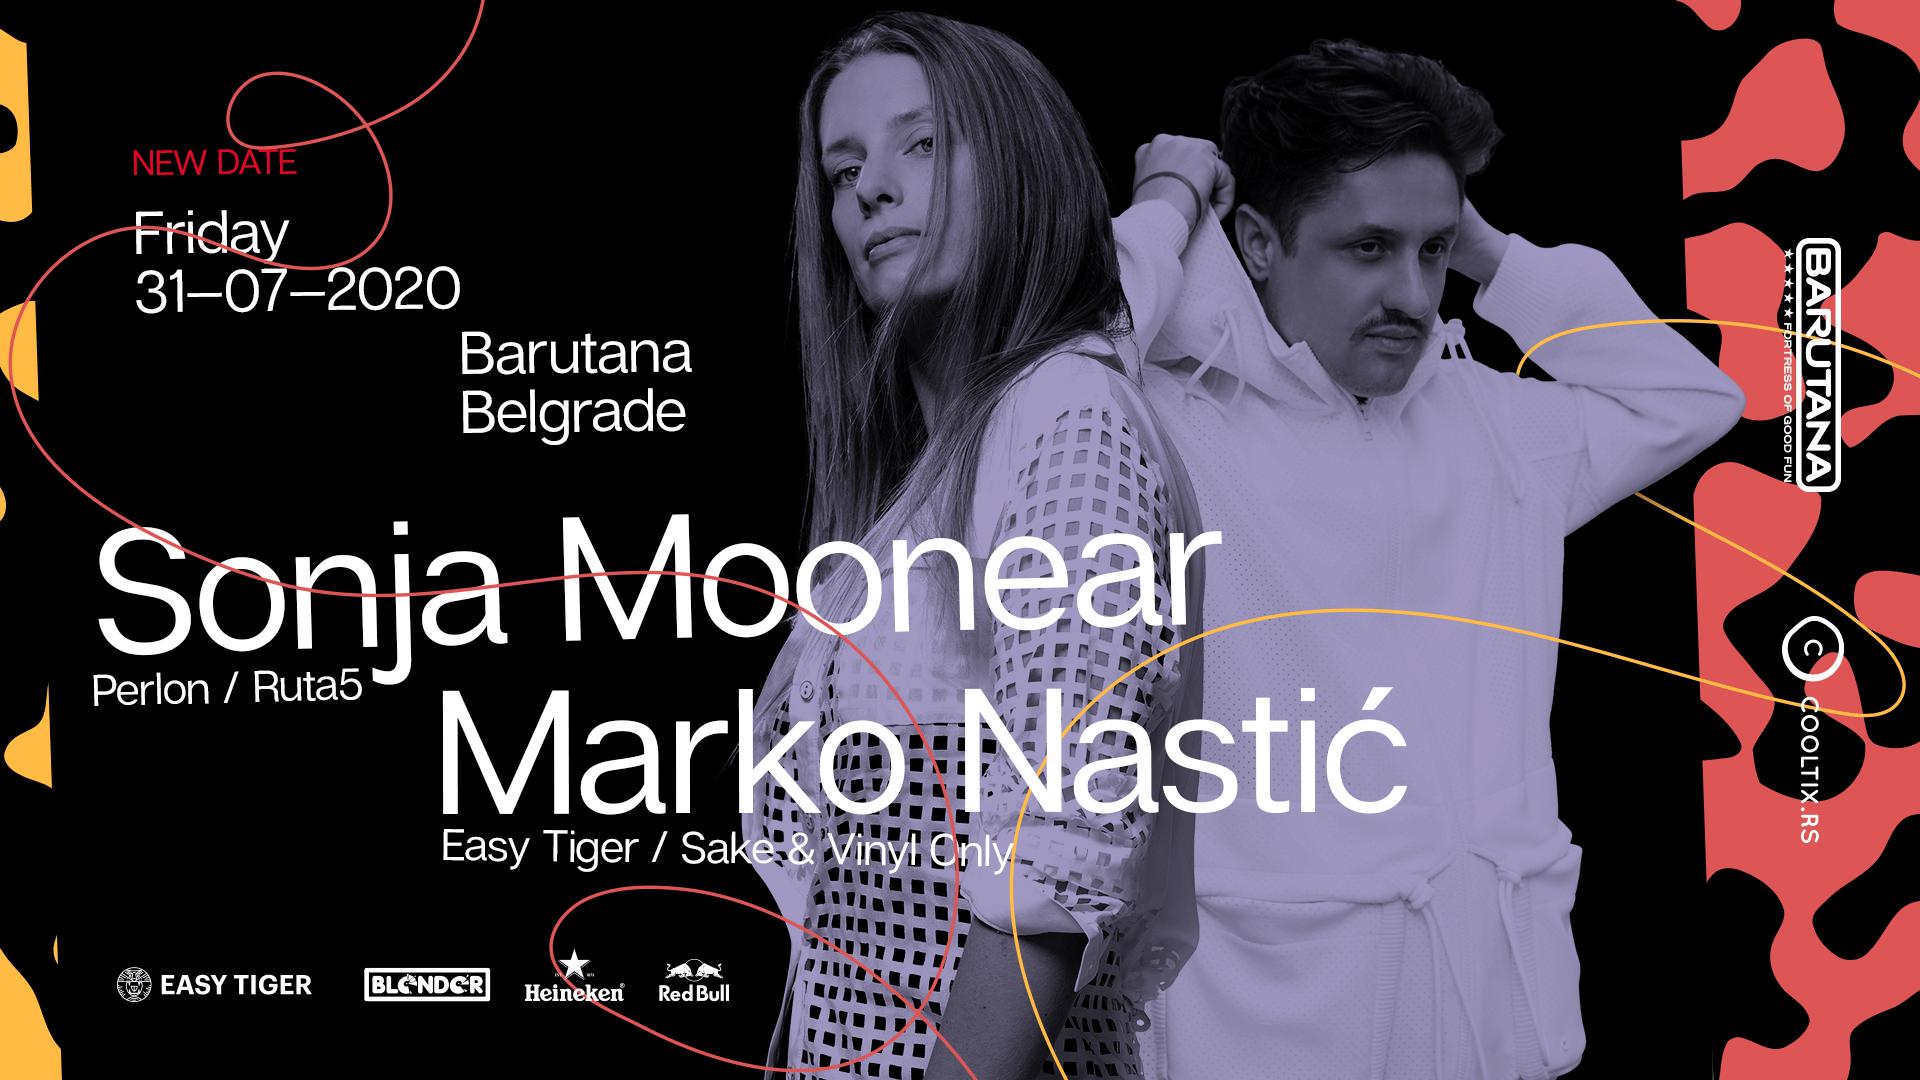 Sonja Moonear, Barutana